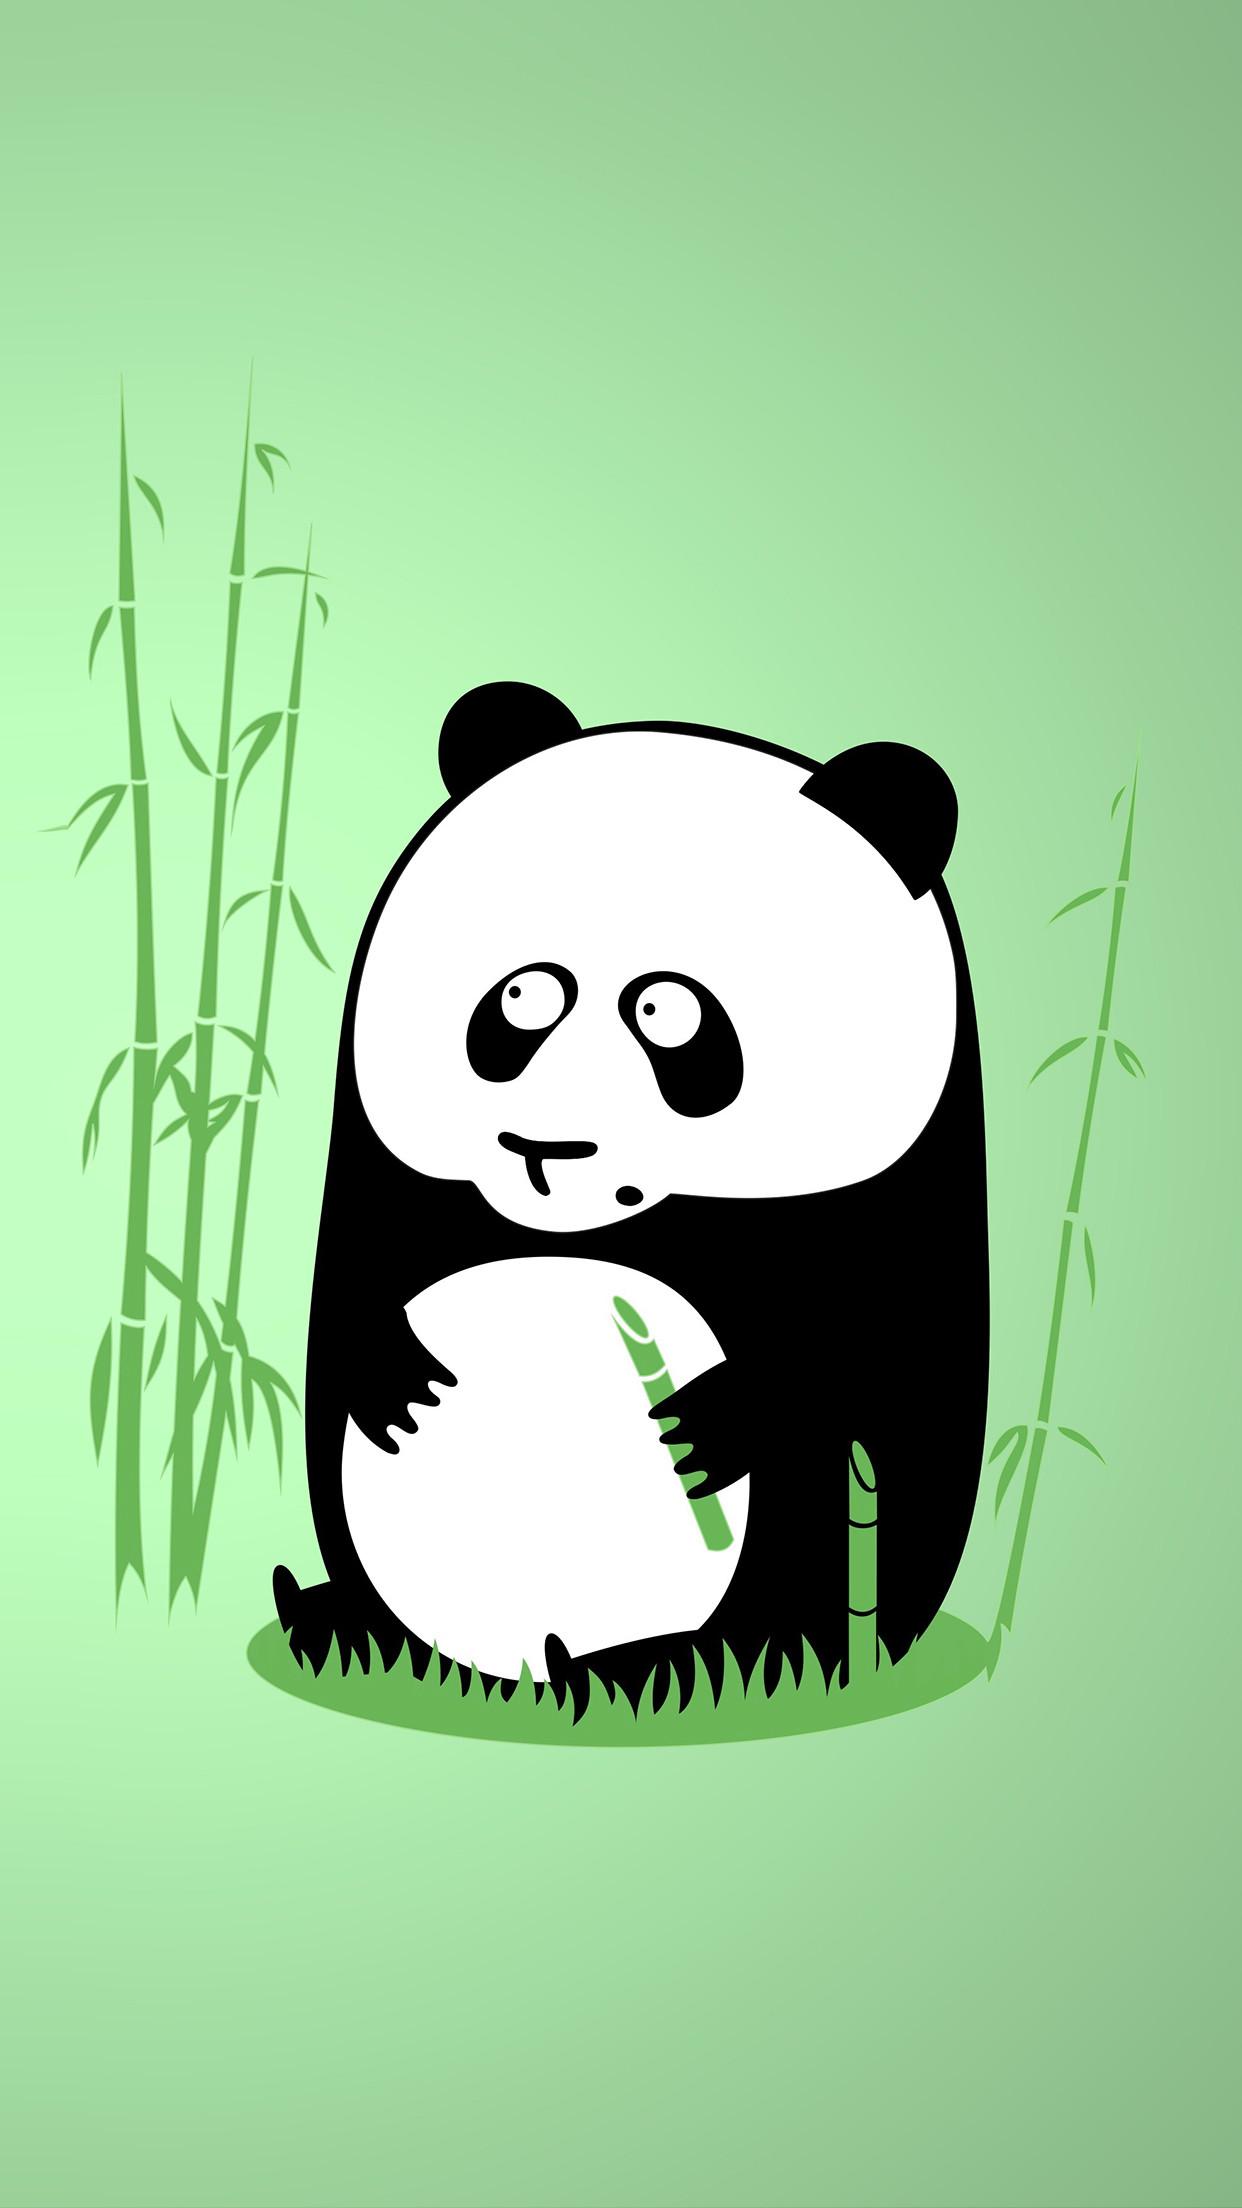 Panda-art-3Wallpapers-iPhone-Parallax